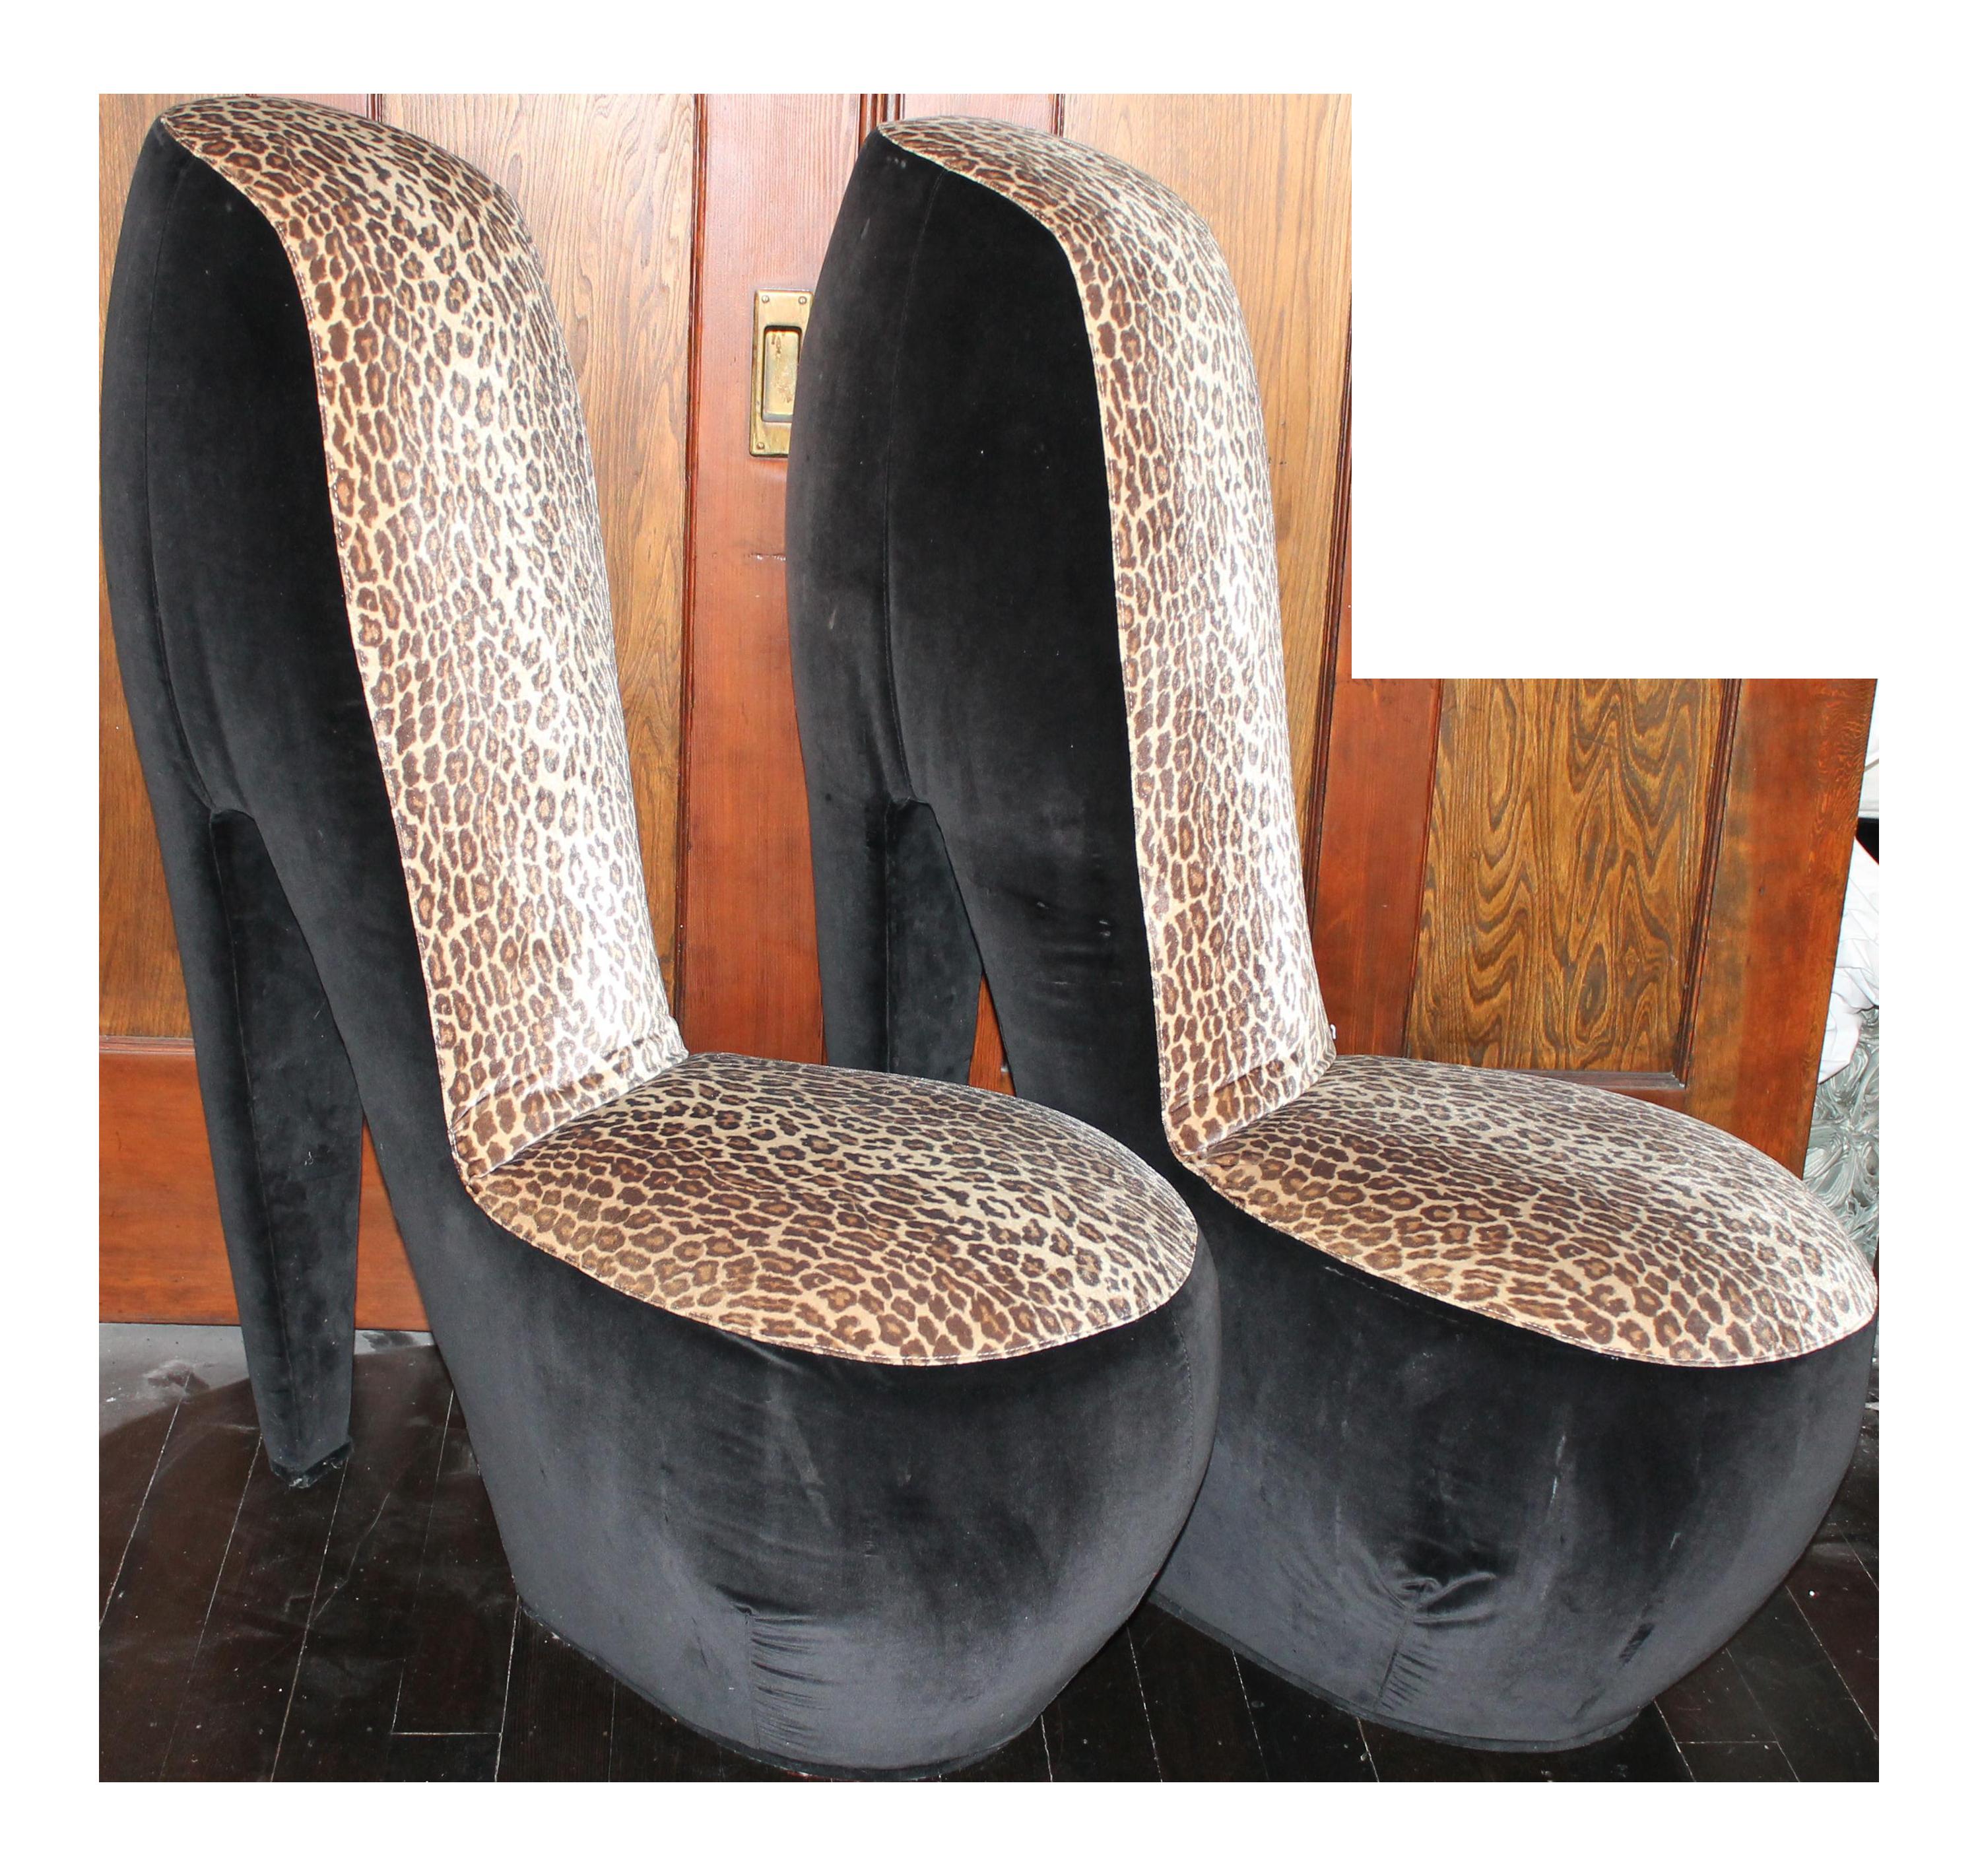 Leopard Print High Heel Shoe Chairs   A Pair